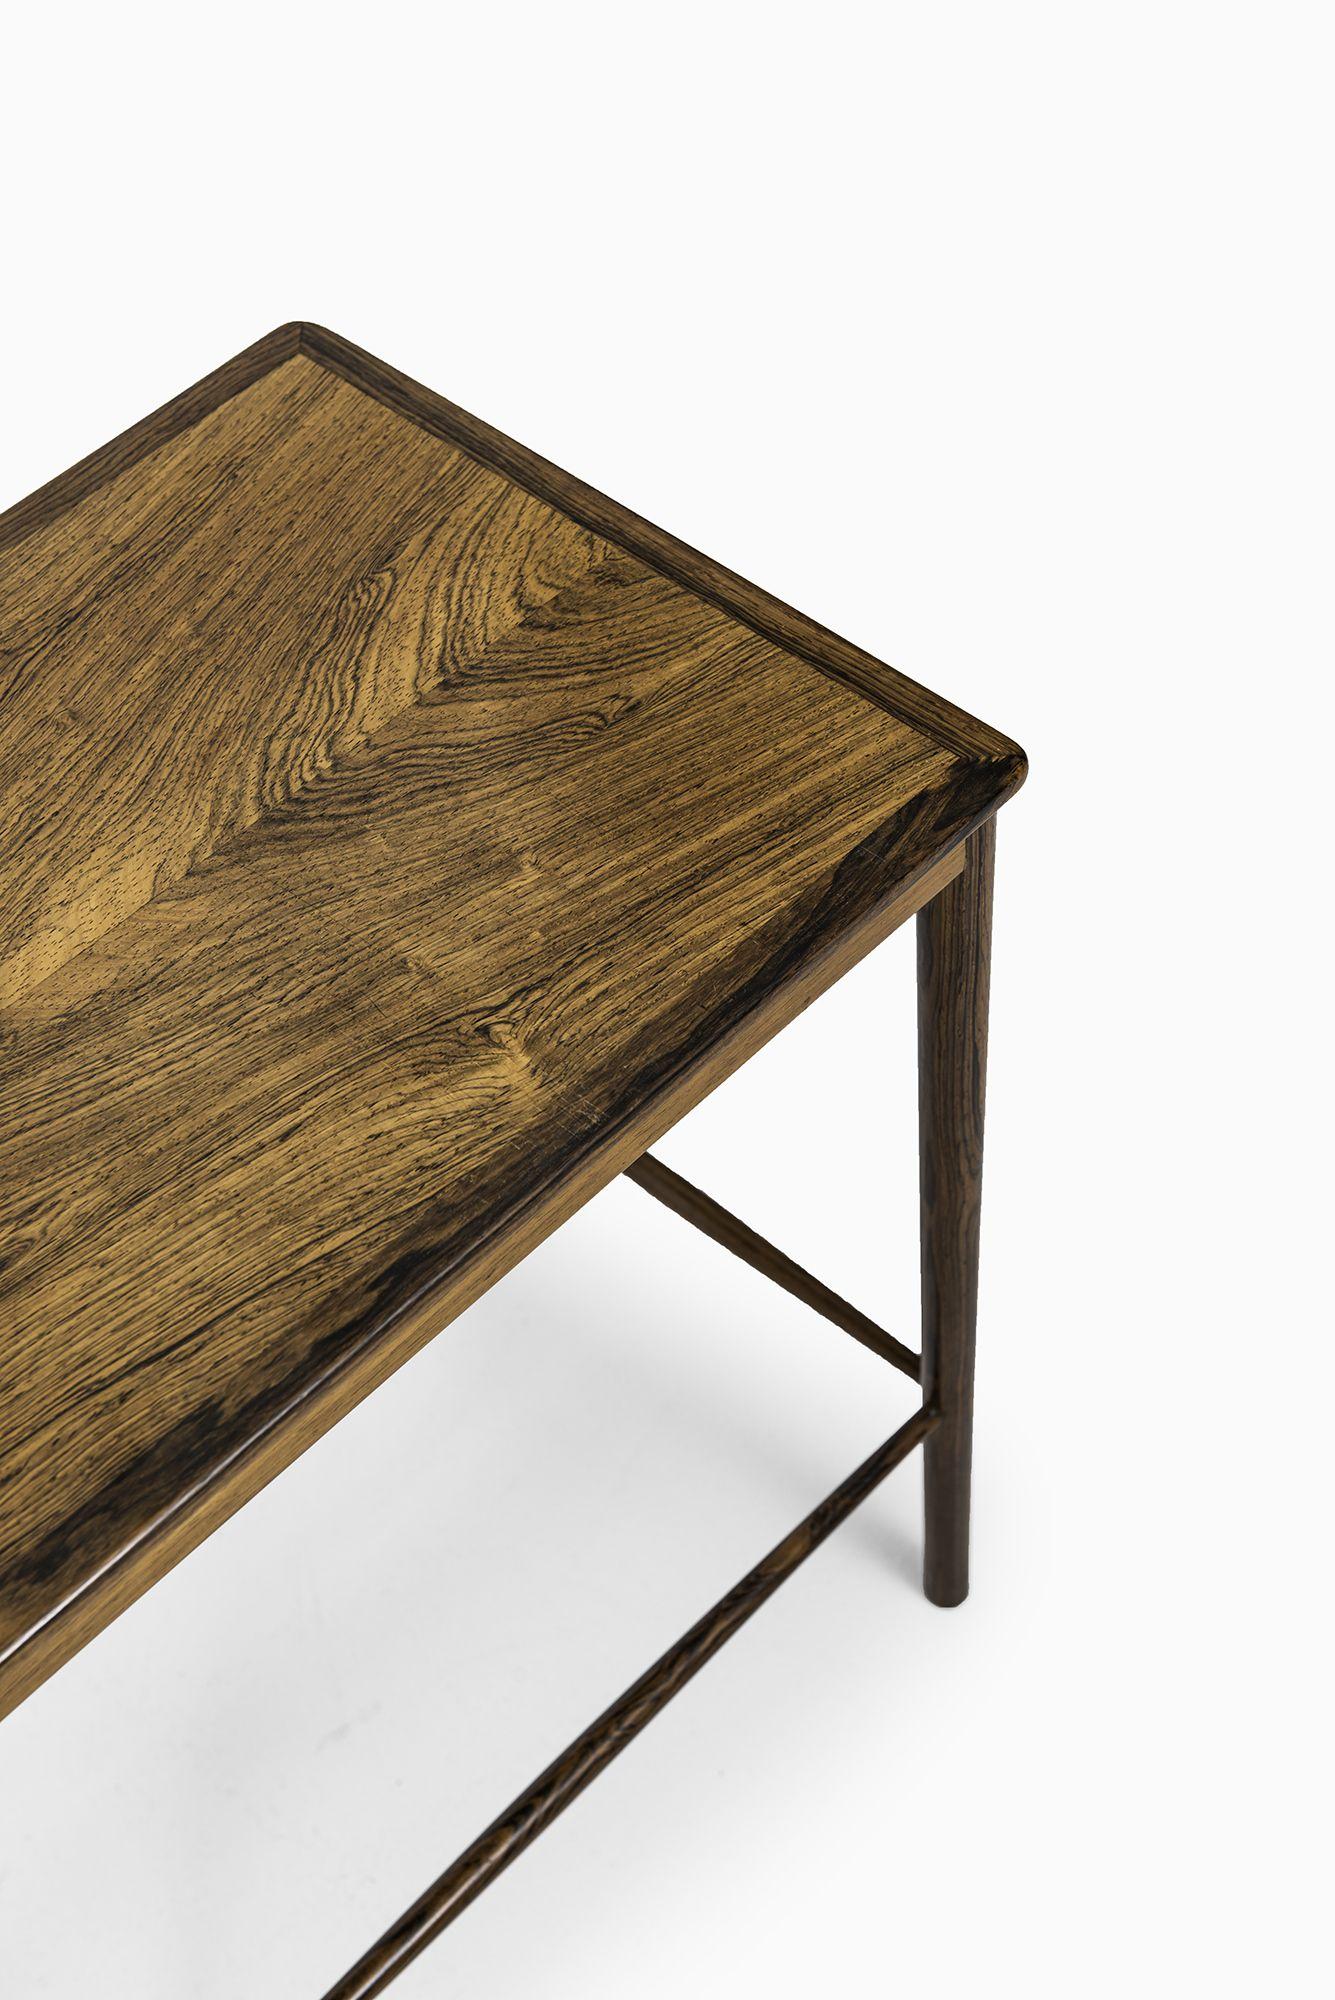 Grete Jalk Nesting Tables In Rosewood At Studio Schalling